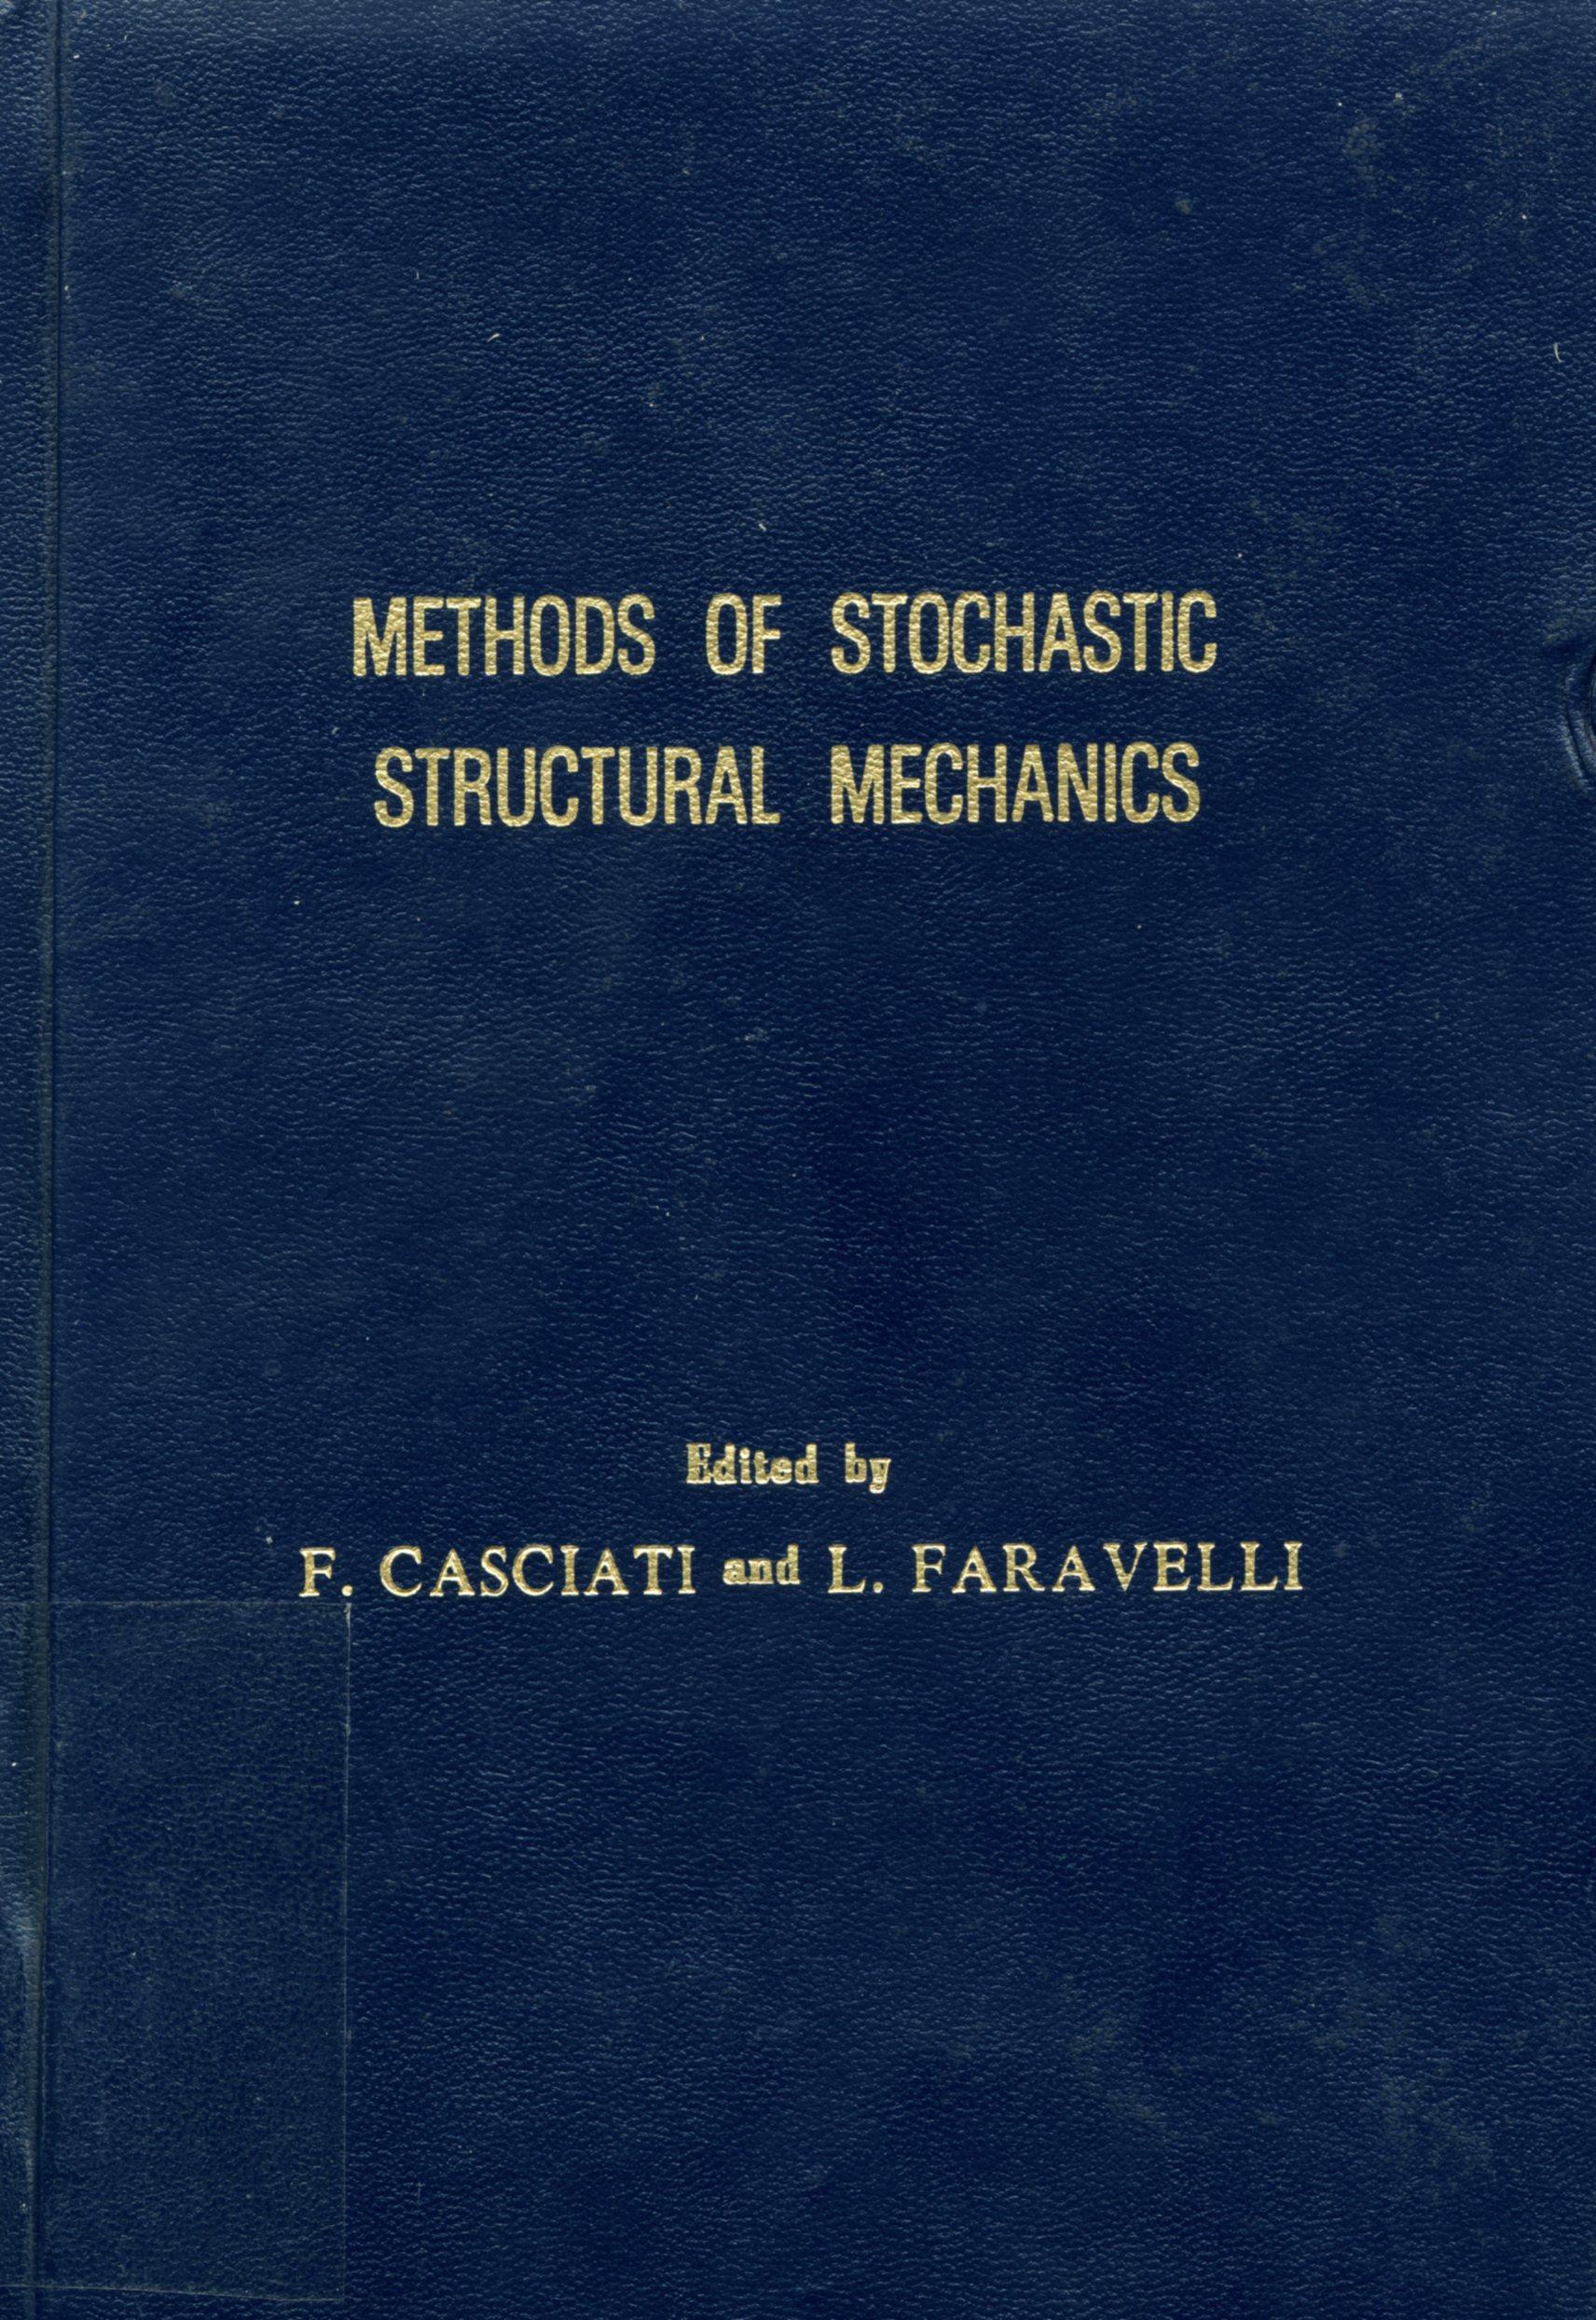 Methods of Stochastic Structural Mechanics